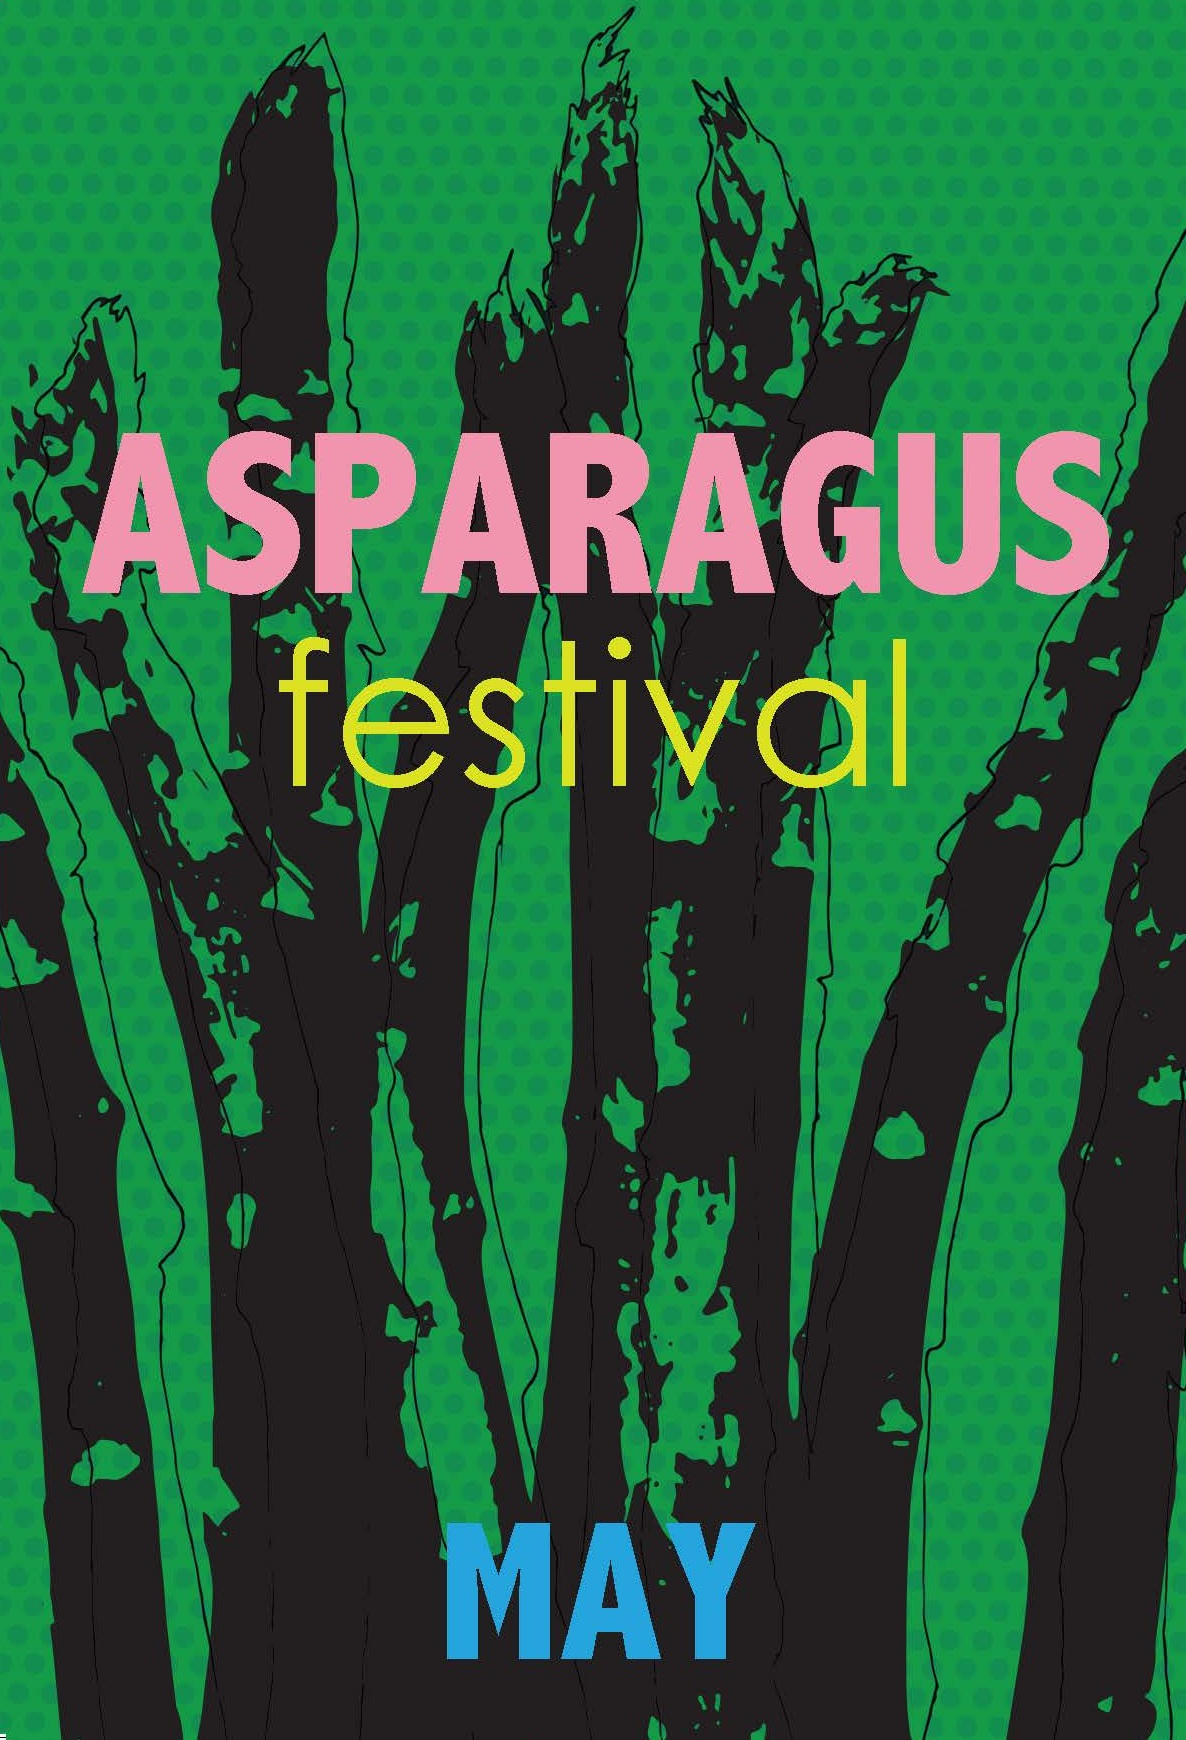 asparagus_fesitvalcard_032319+%281%29.jpg